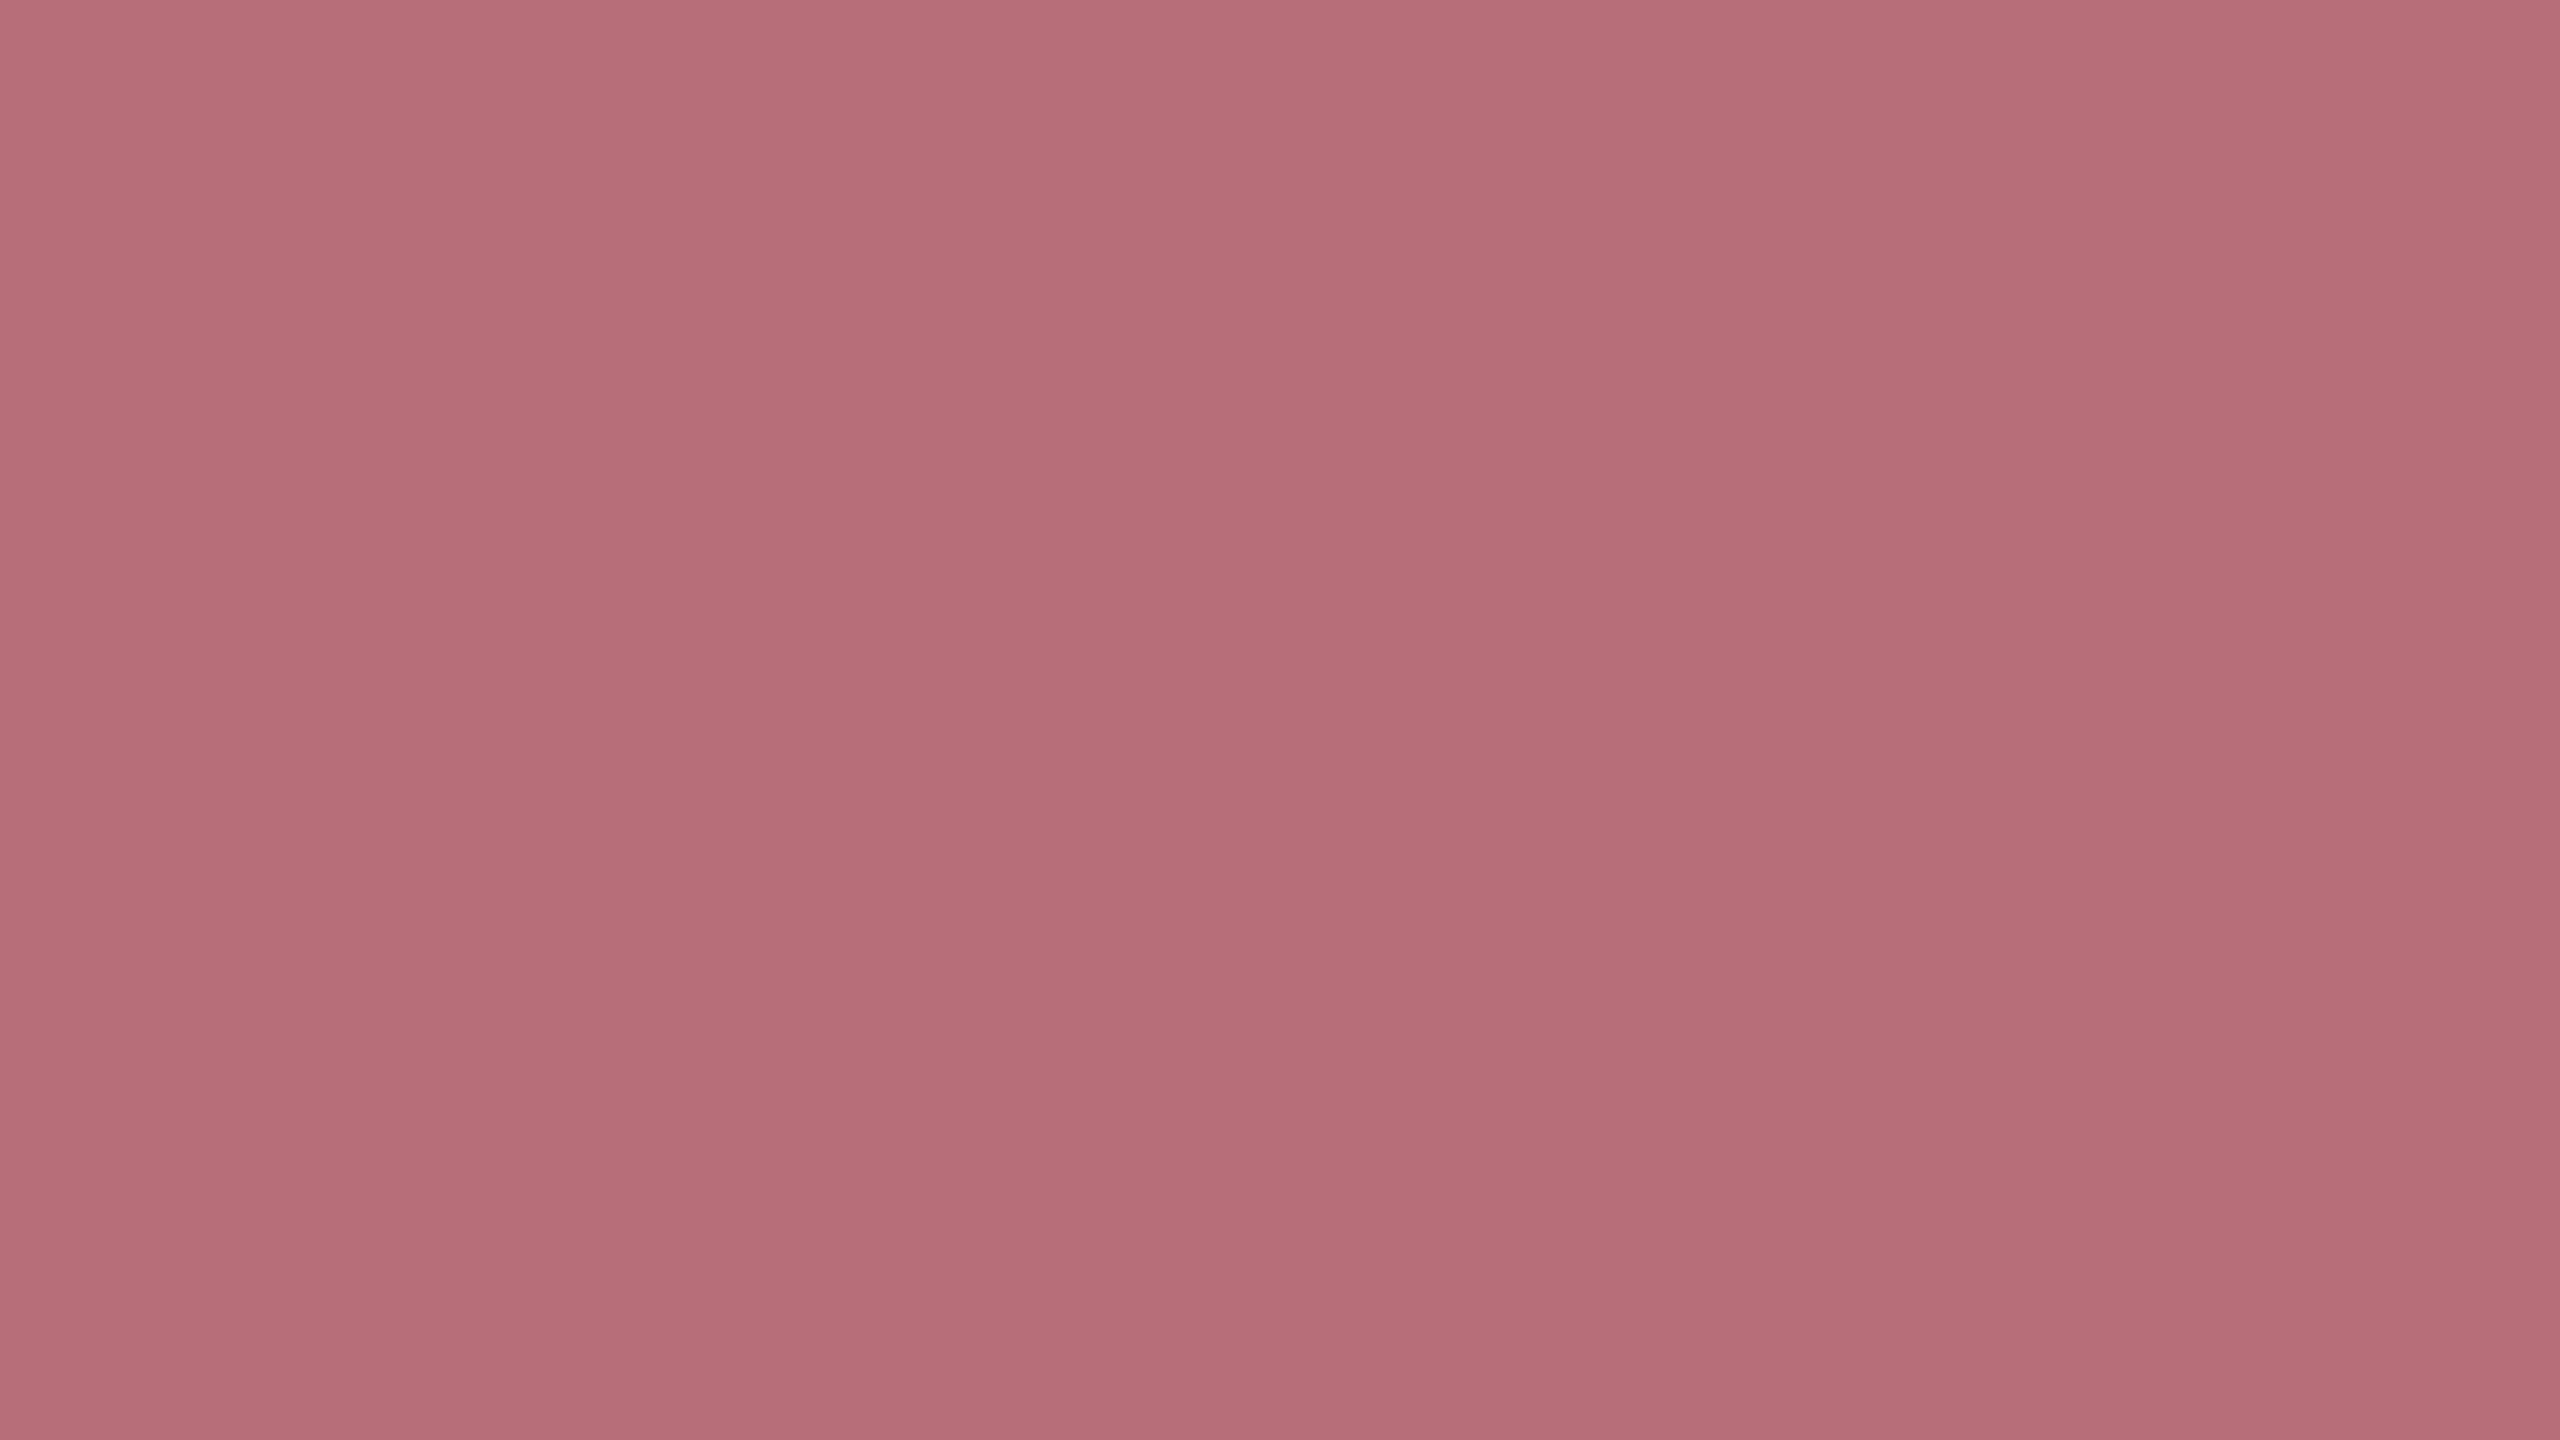 2560x1440 Rose Gold Solid Color Background